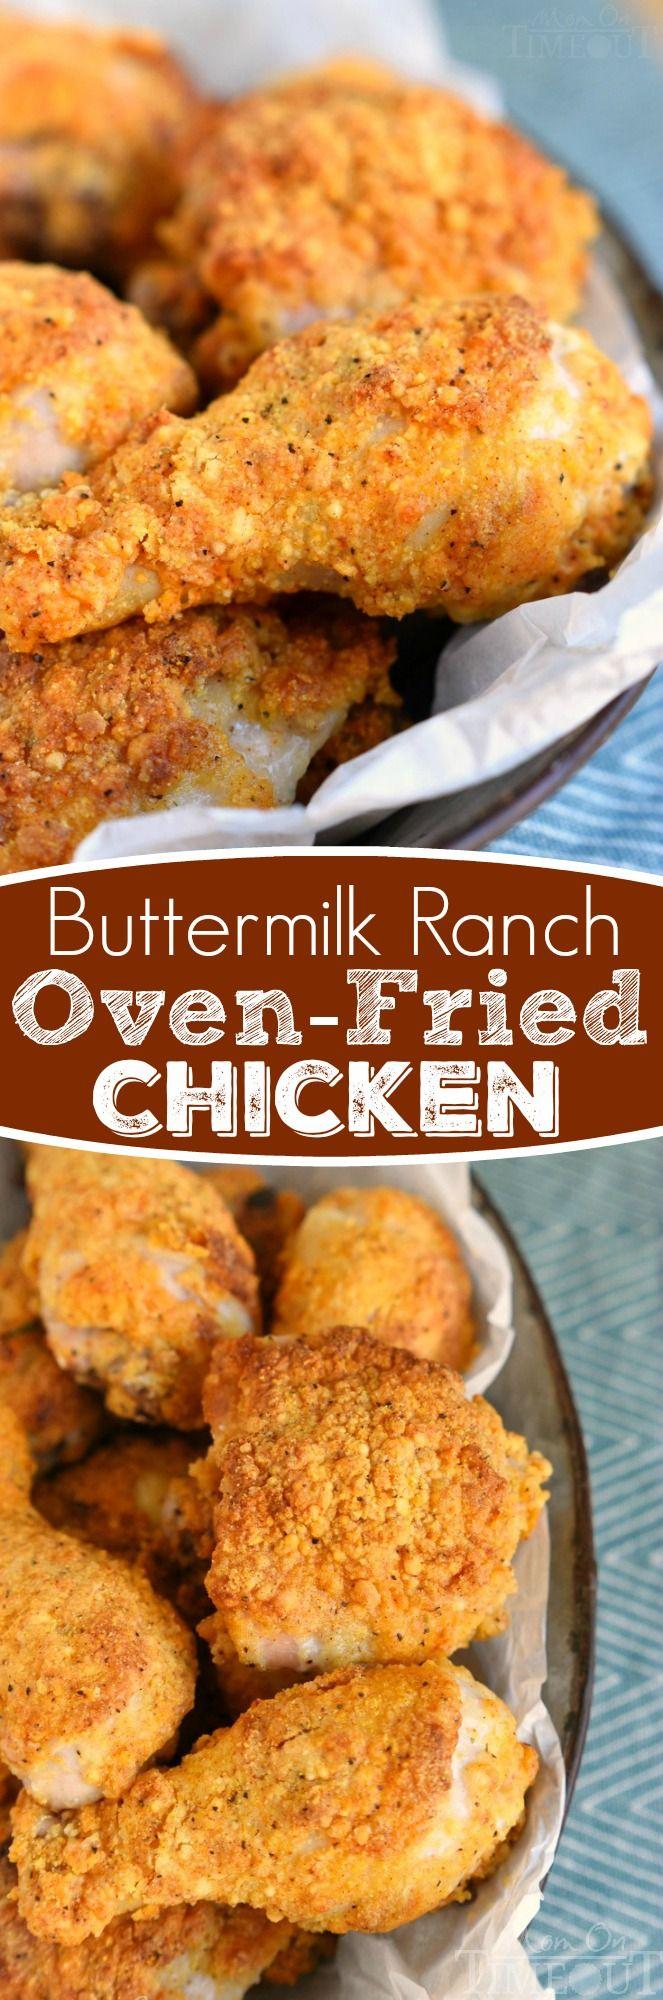 Buttermilk Ranch Oven Fried Chicken Recipes Oven Fried Chicken Oven Fried Chicken Recipes